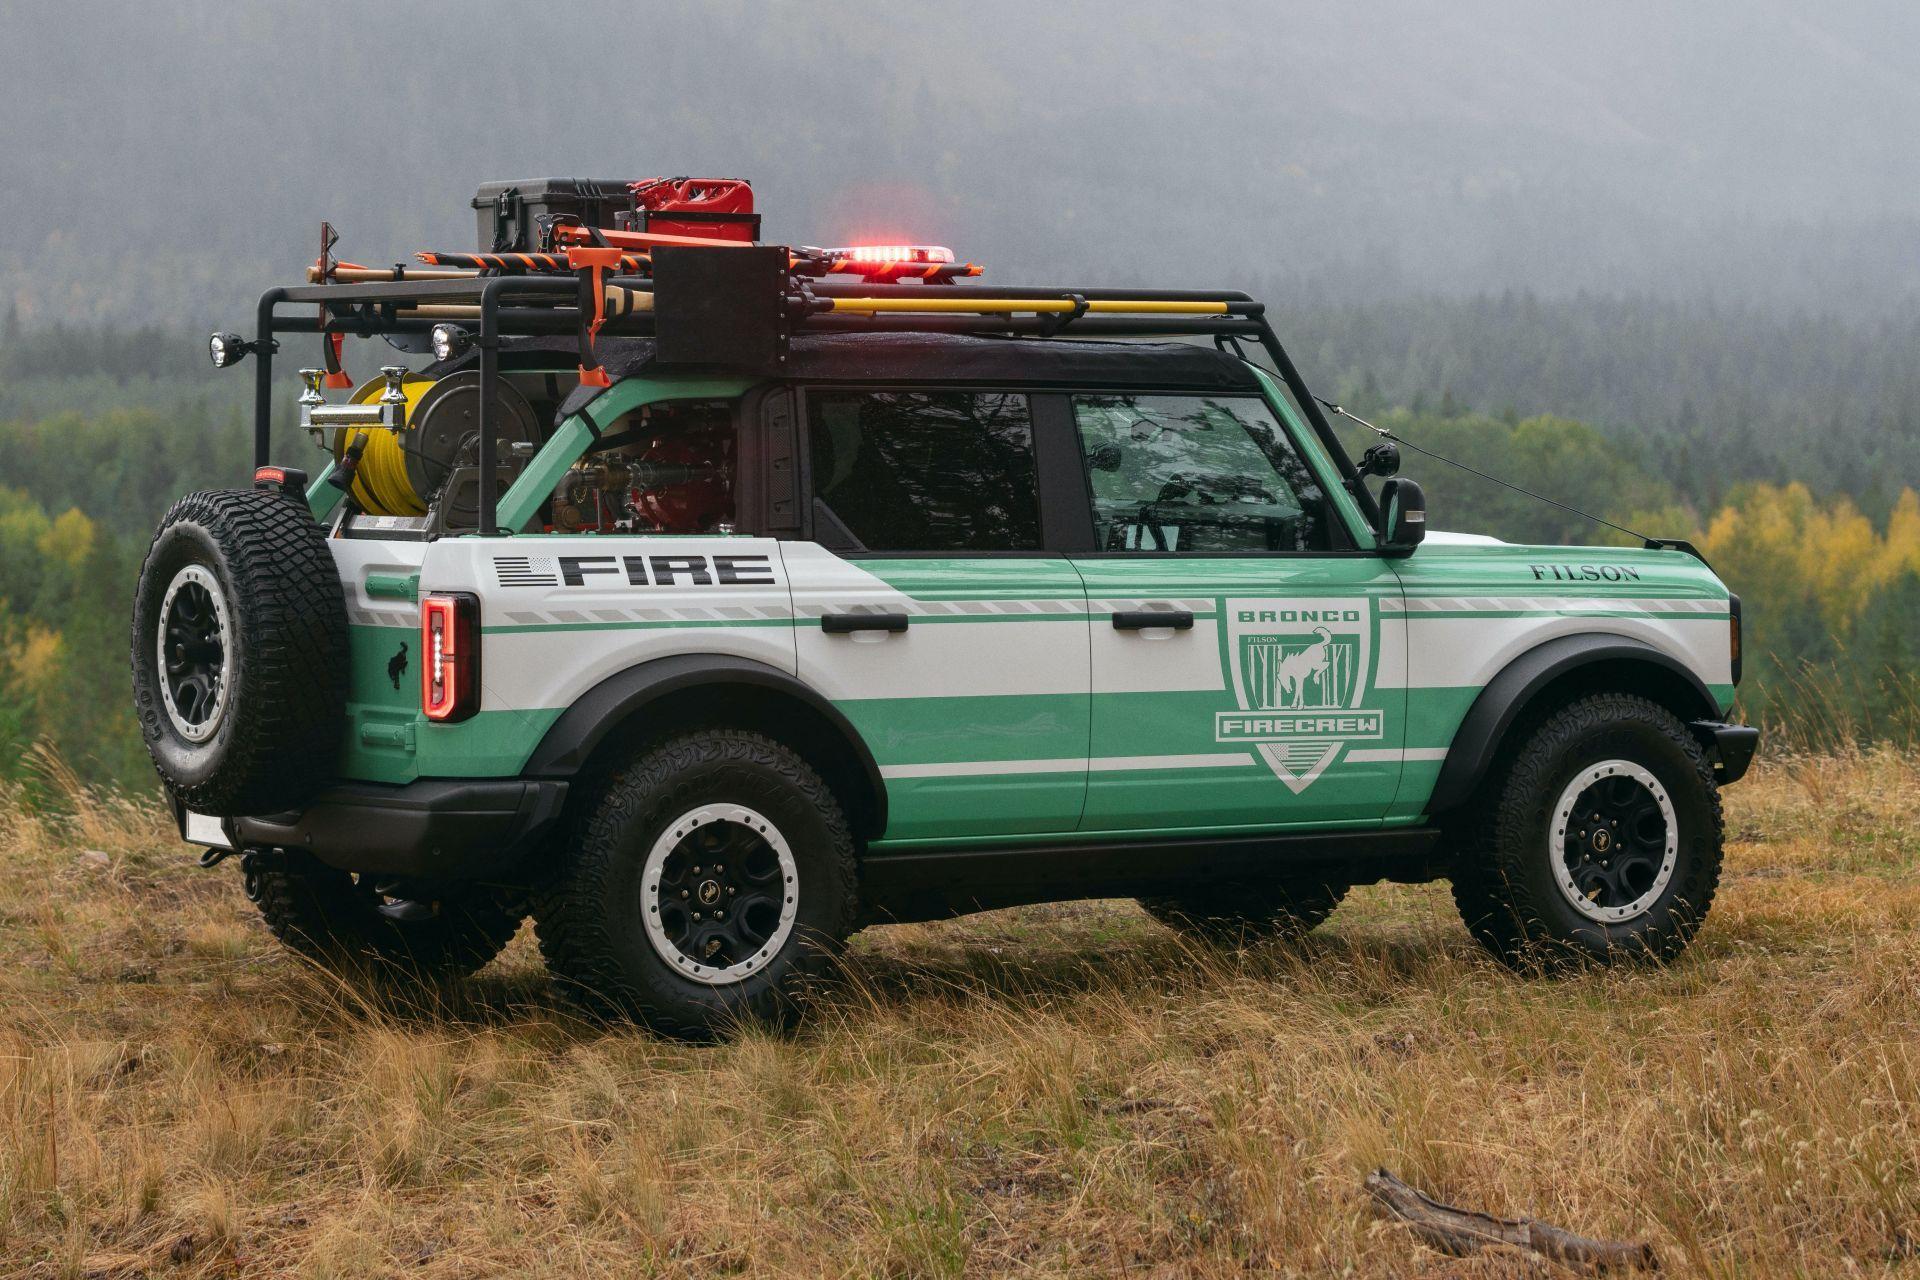 Ford-Bronco-Wildland-Fire-Rig-Concept-9